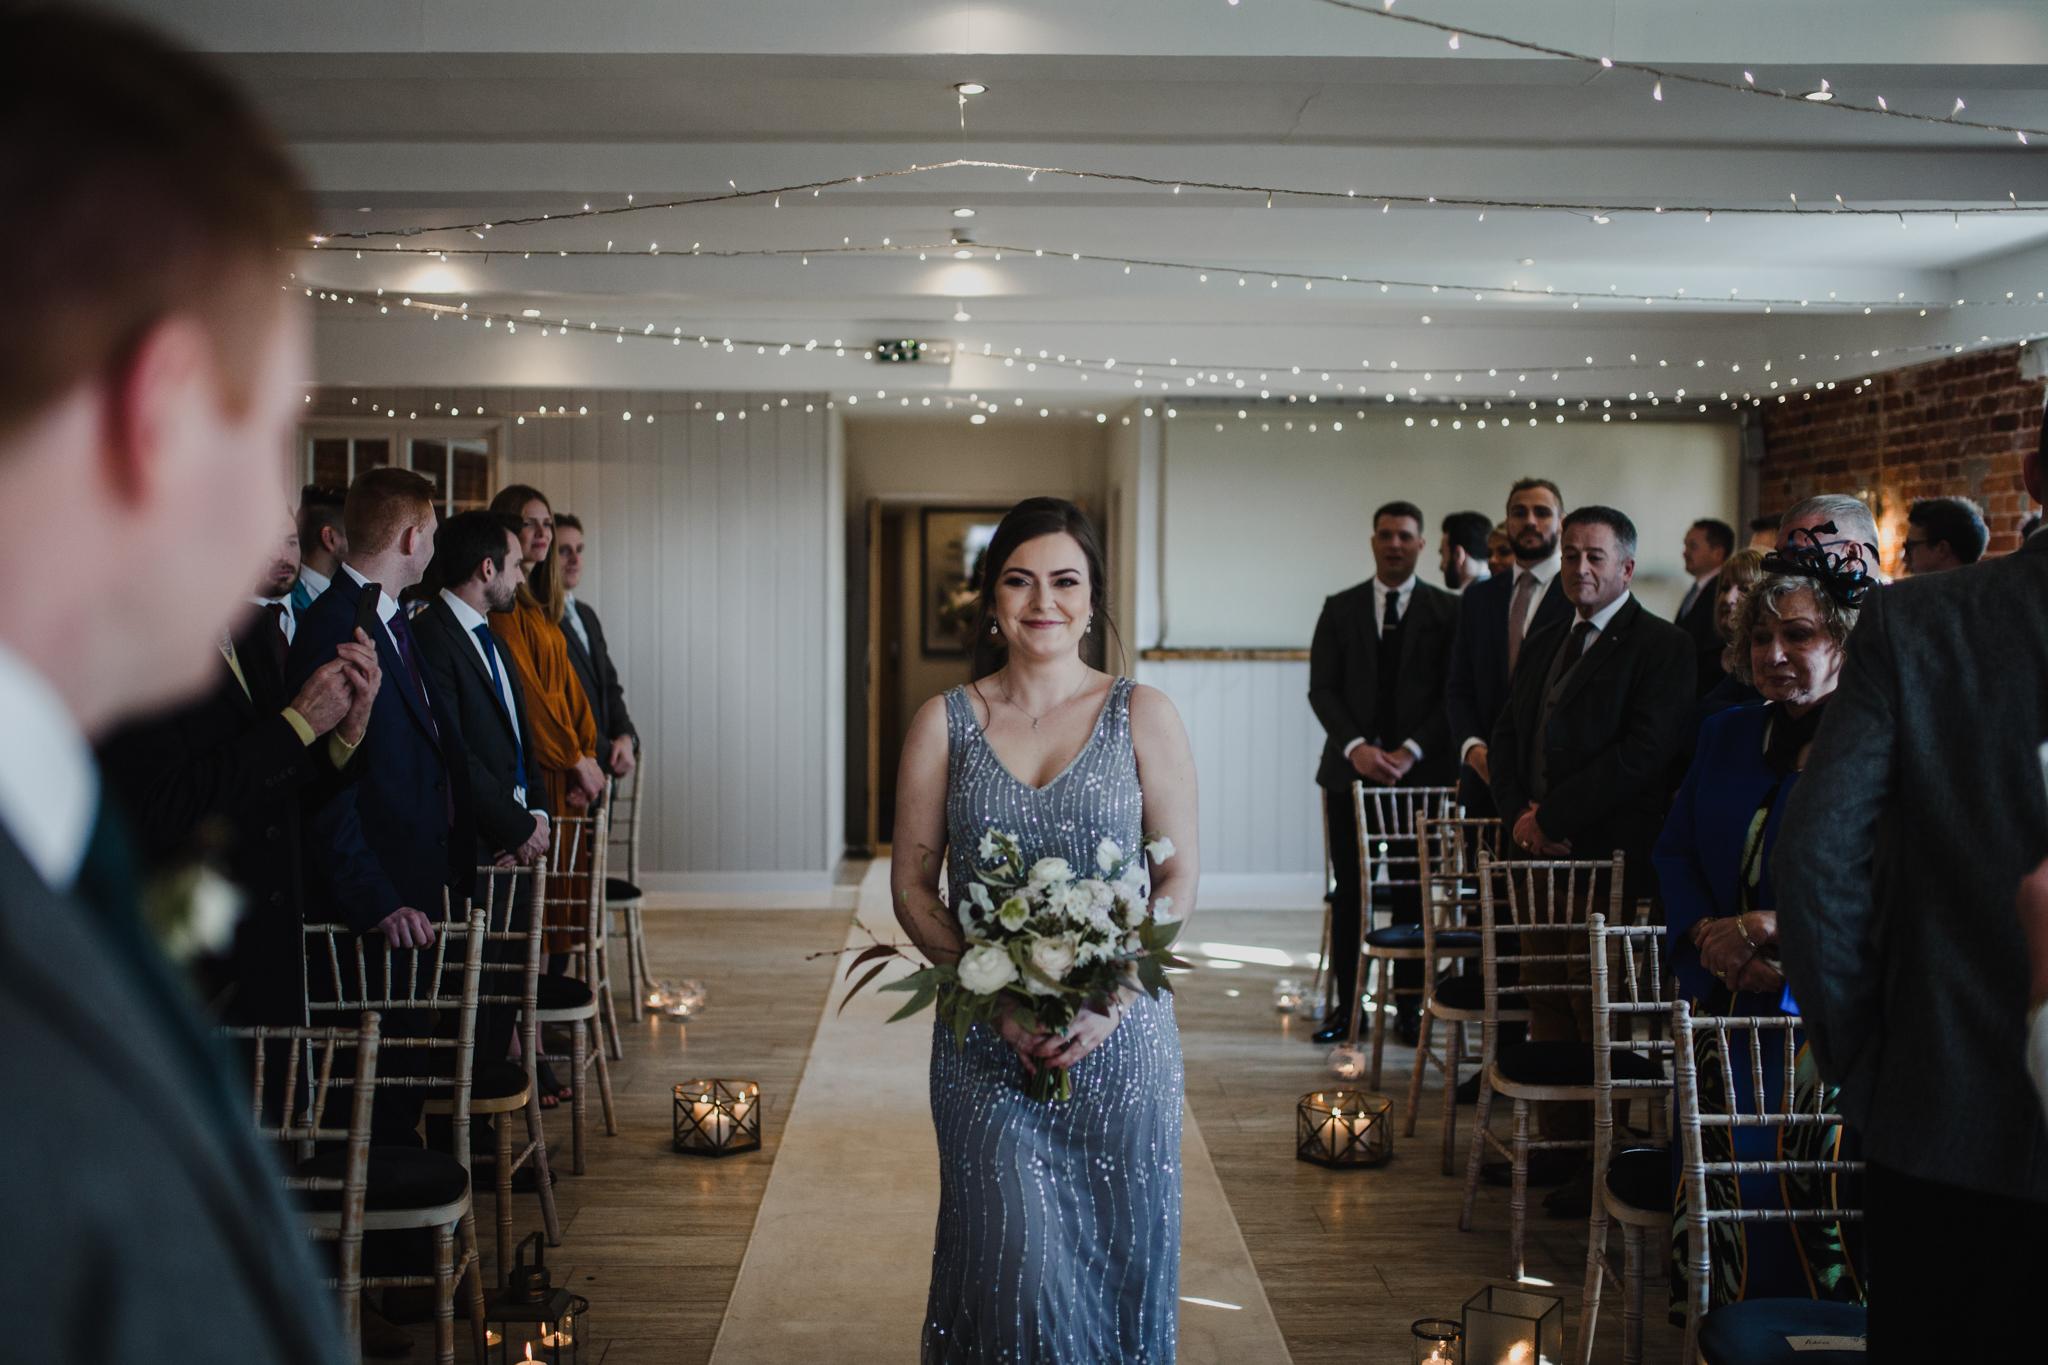 Bridesmaid walking down the aisle at Sopley Mill wedding venue